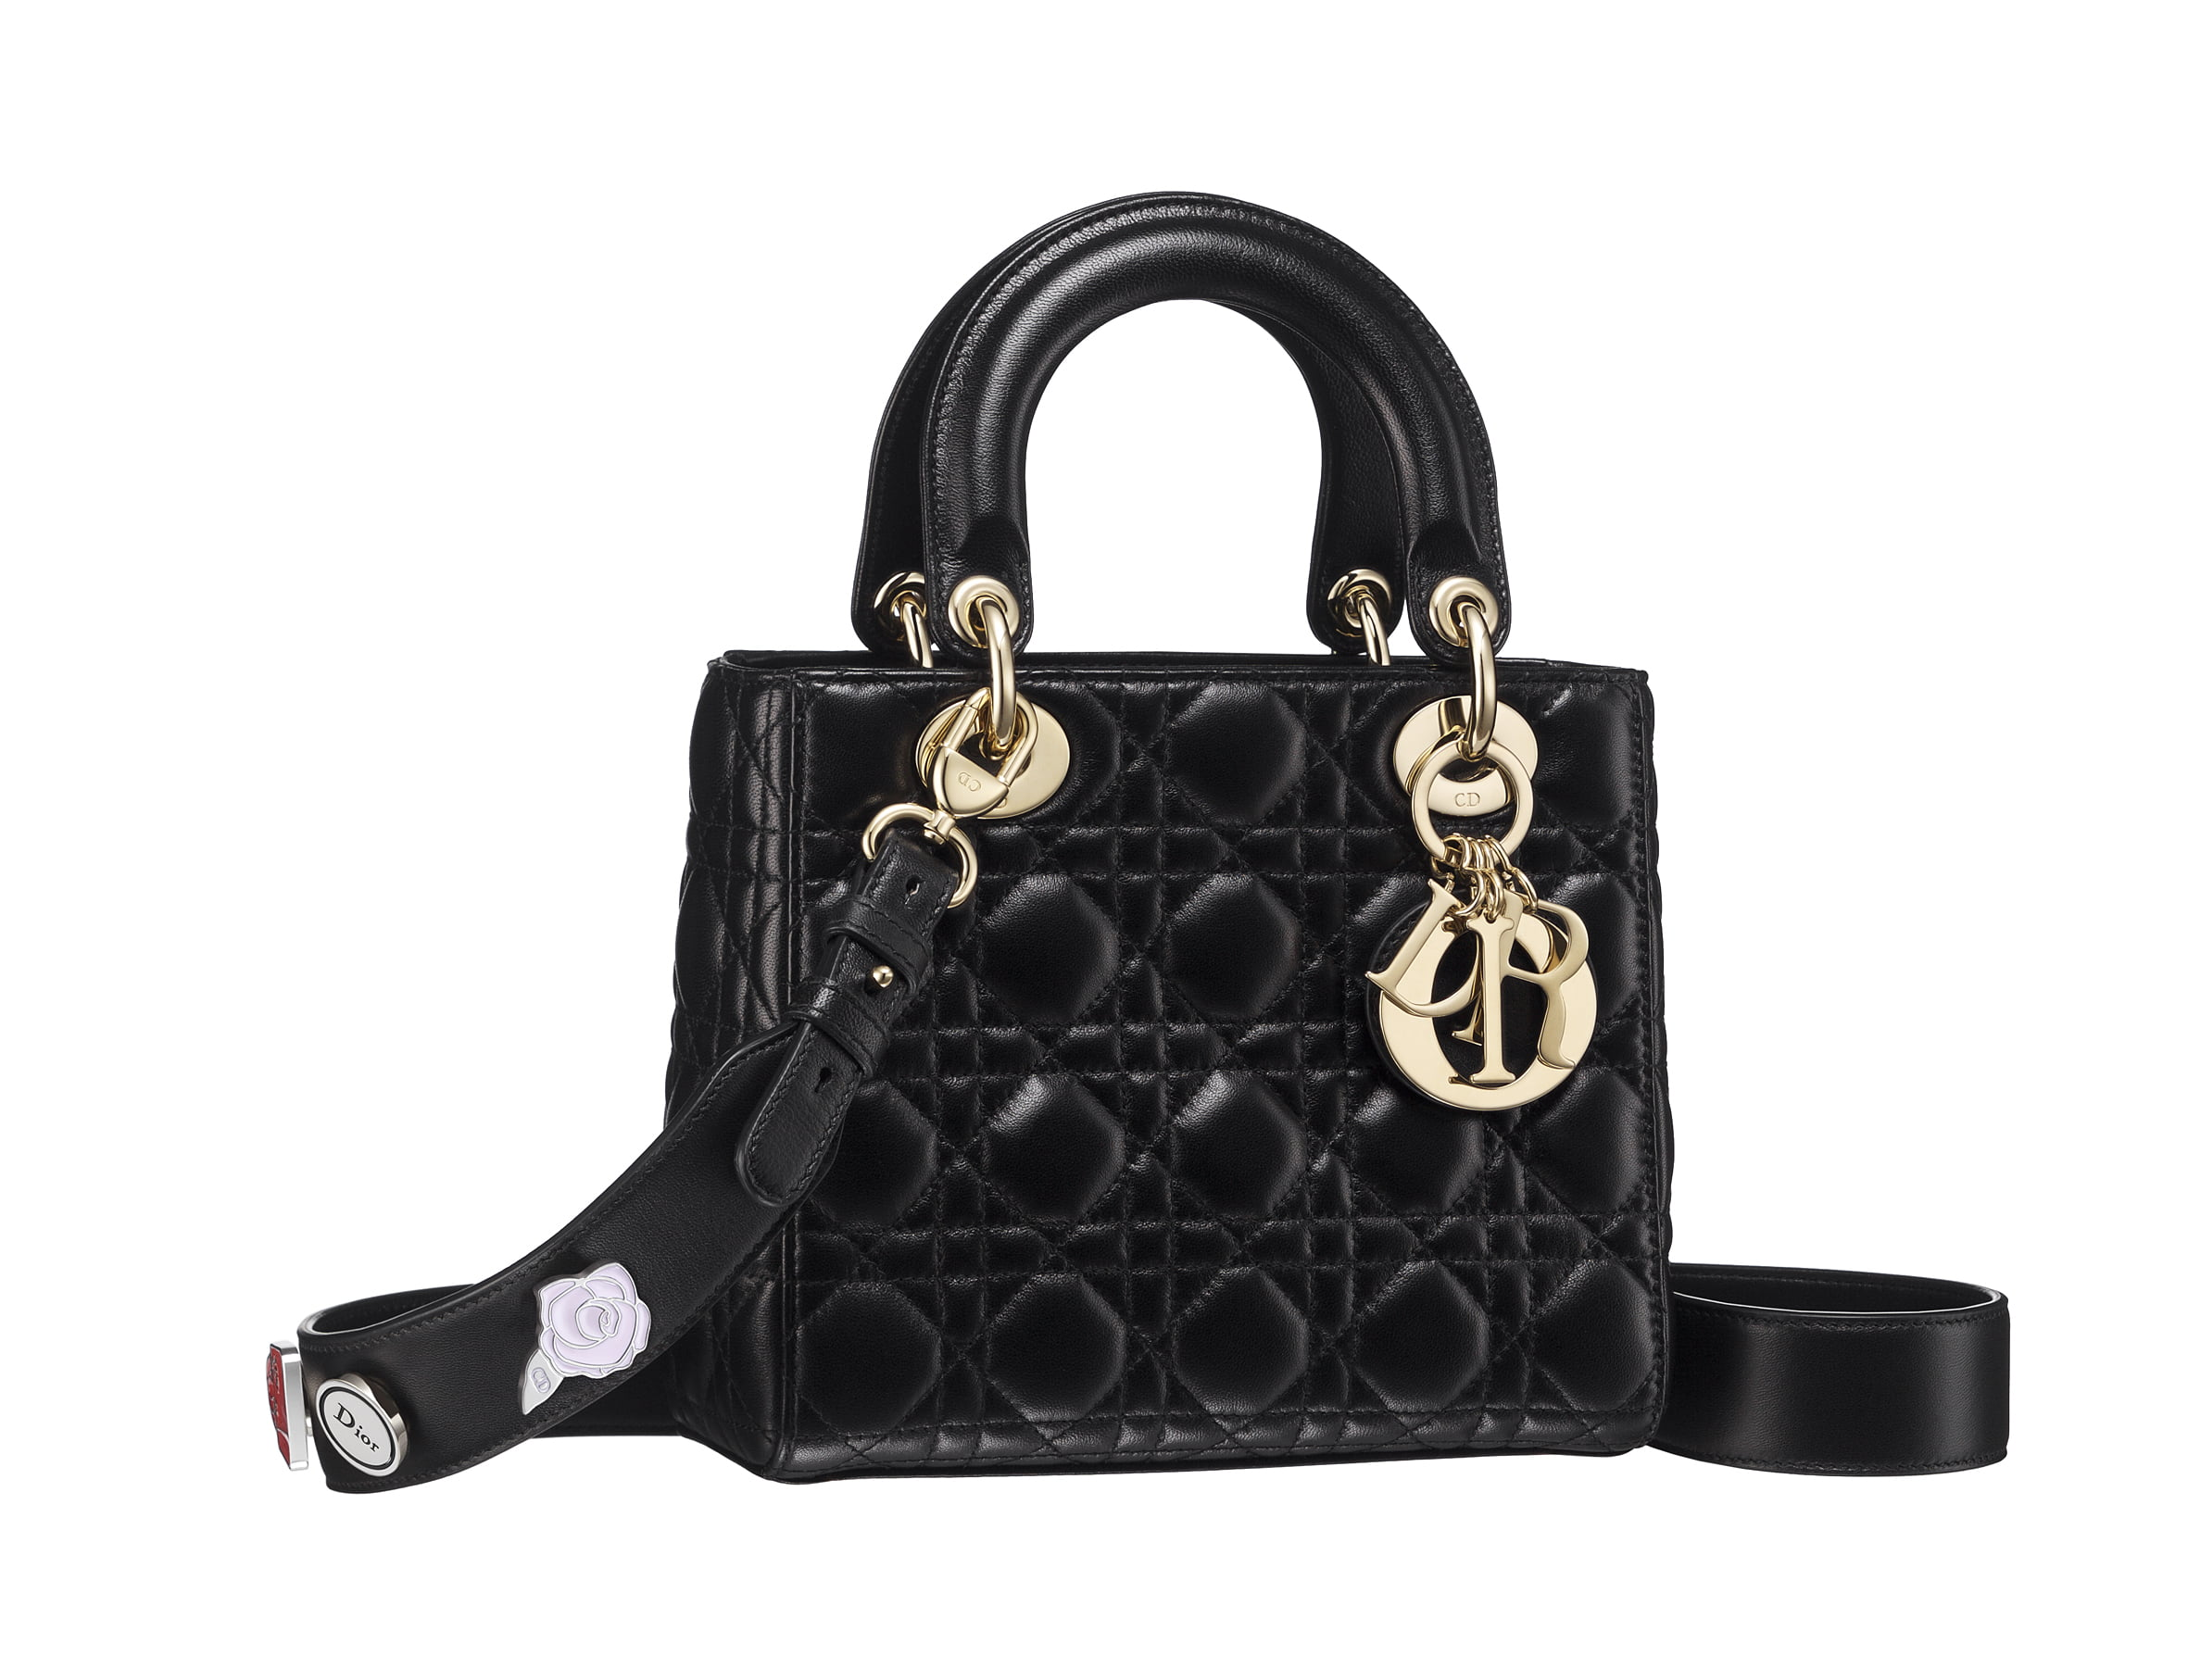 Lady Dior Small Pins - Black w Gold